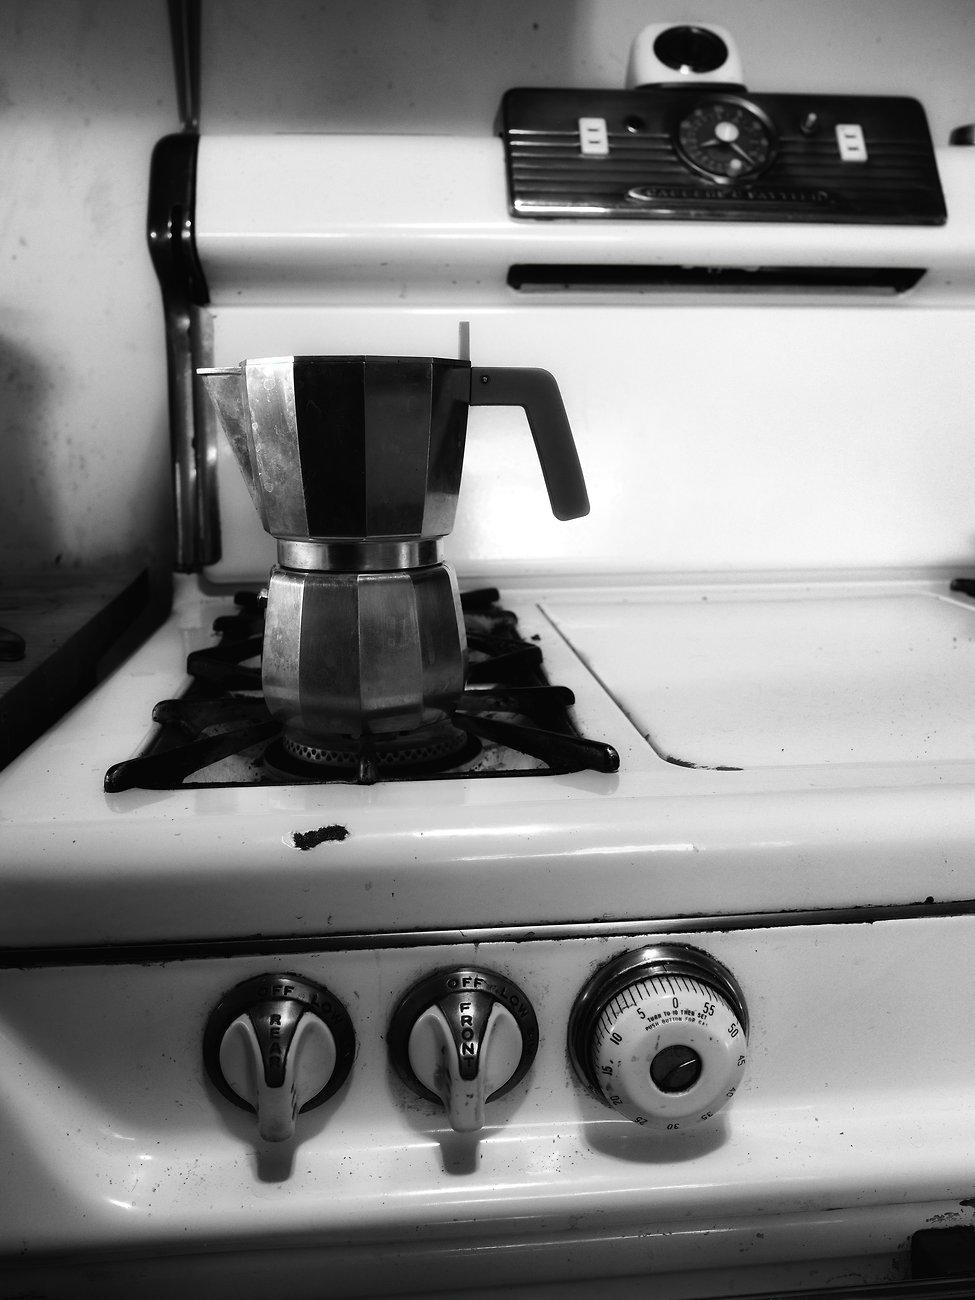 PenF_Day23_Stovetop_espresso.jpg